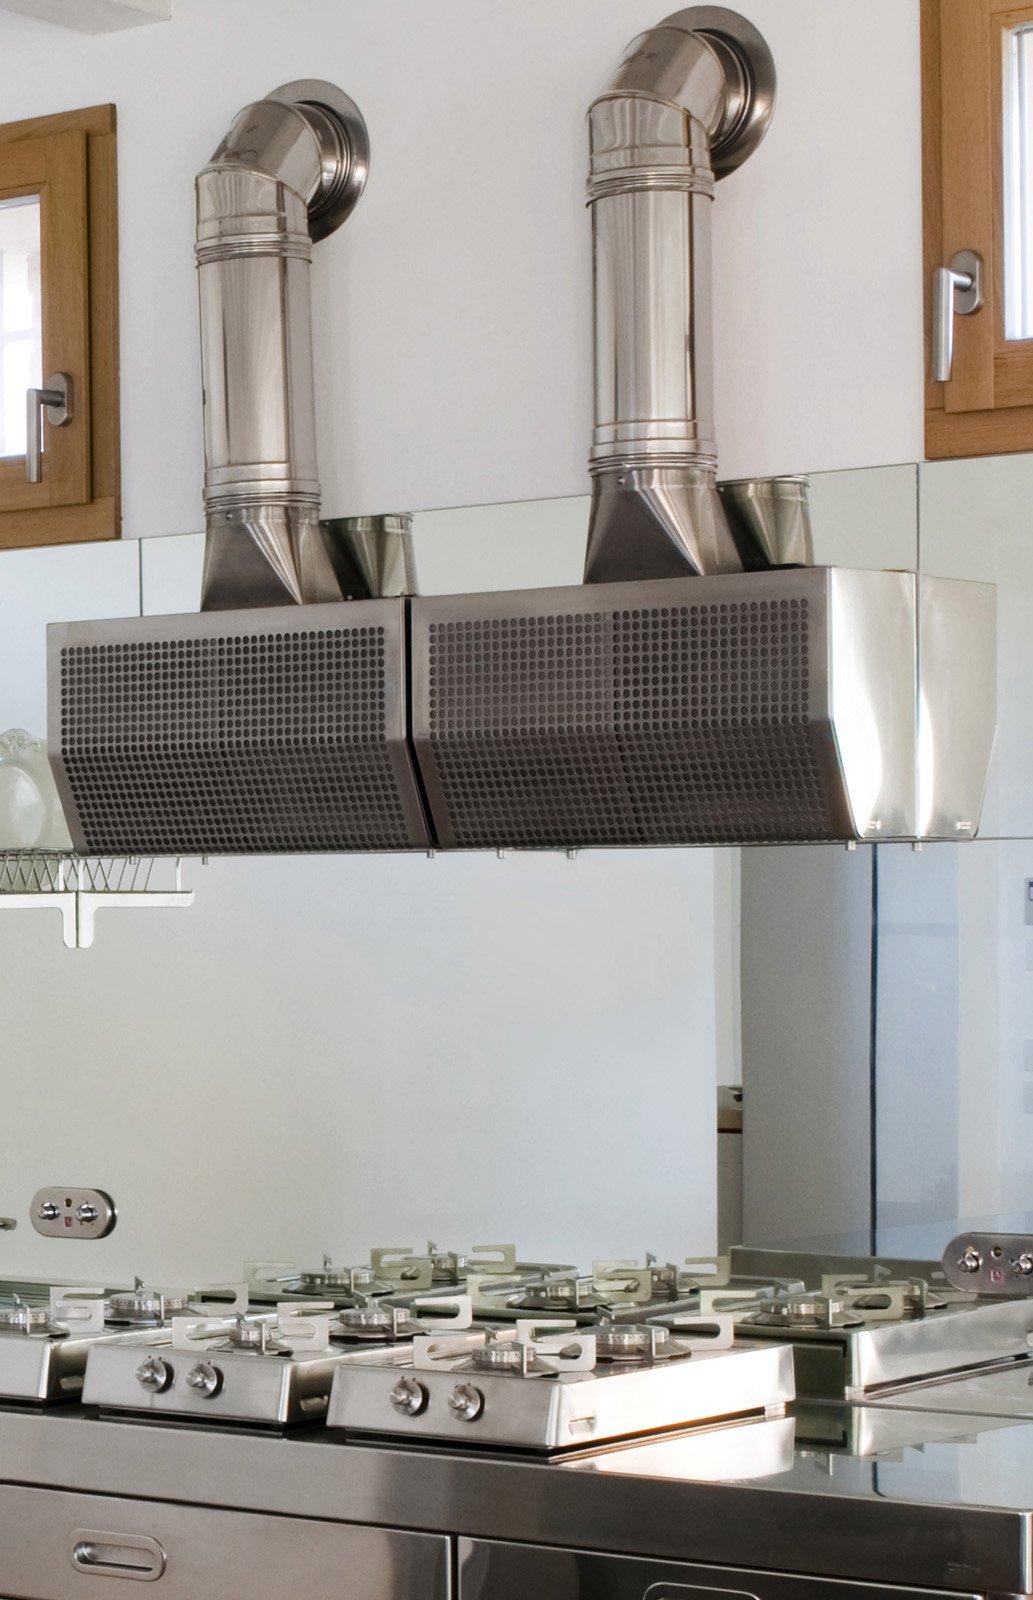 Cappe per la cucina cose di casa - Cucina acciaio prezzi ...